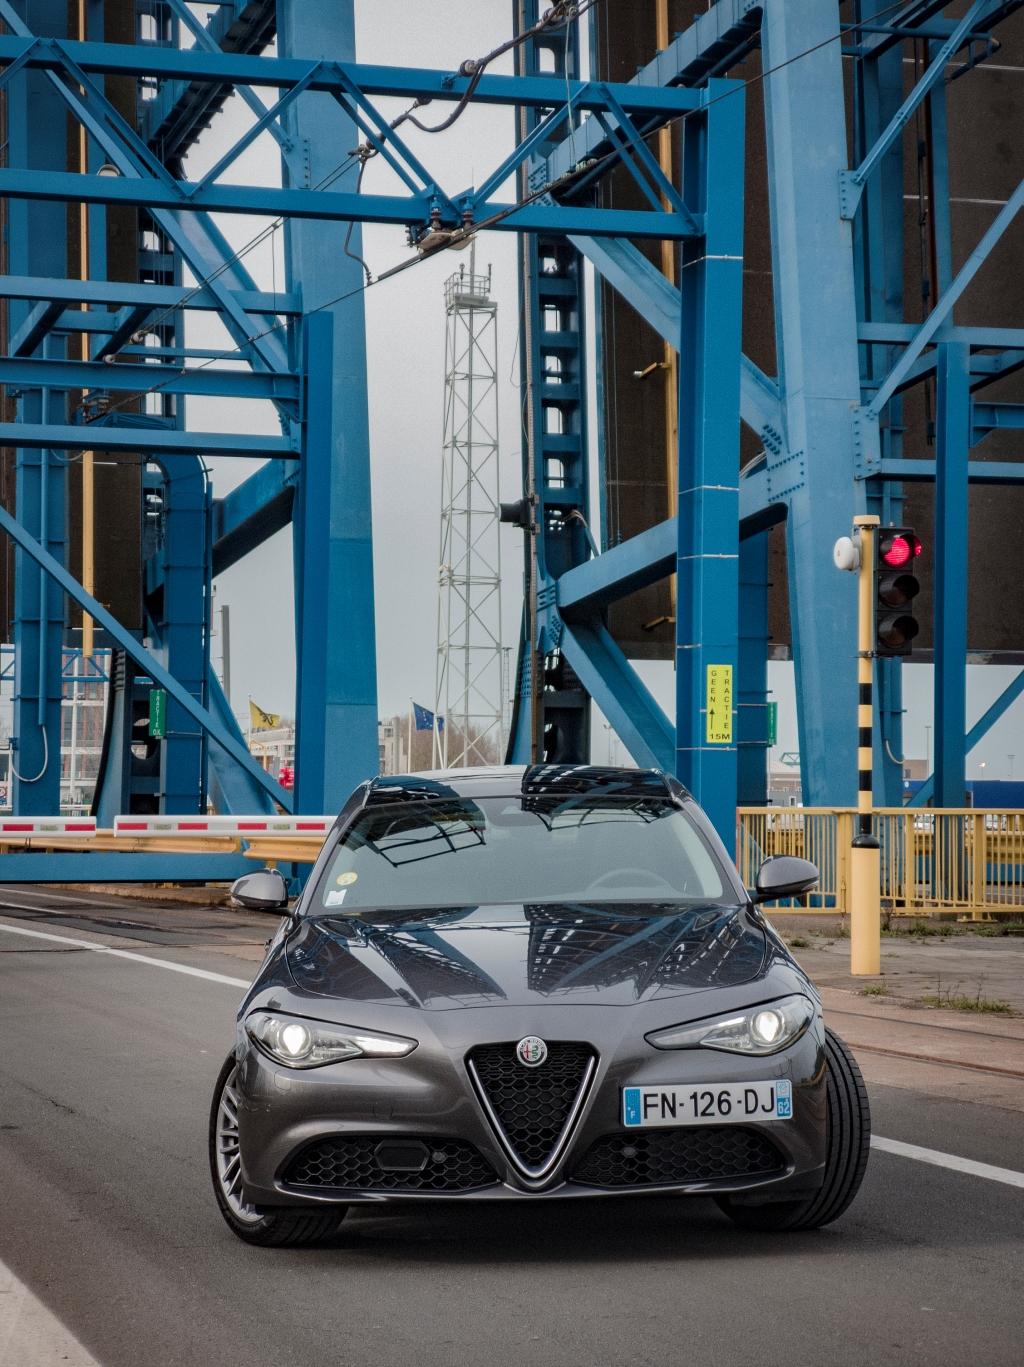 Un peu de rouge pour une Alfa- Alfa Romeo Giulia, dame de coeur